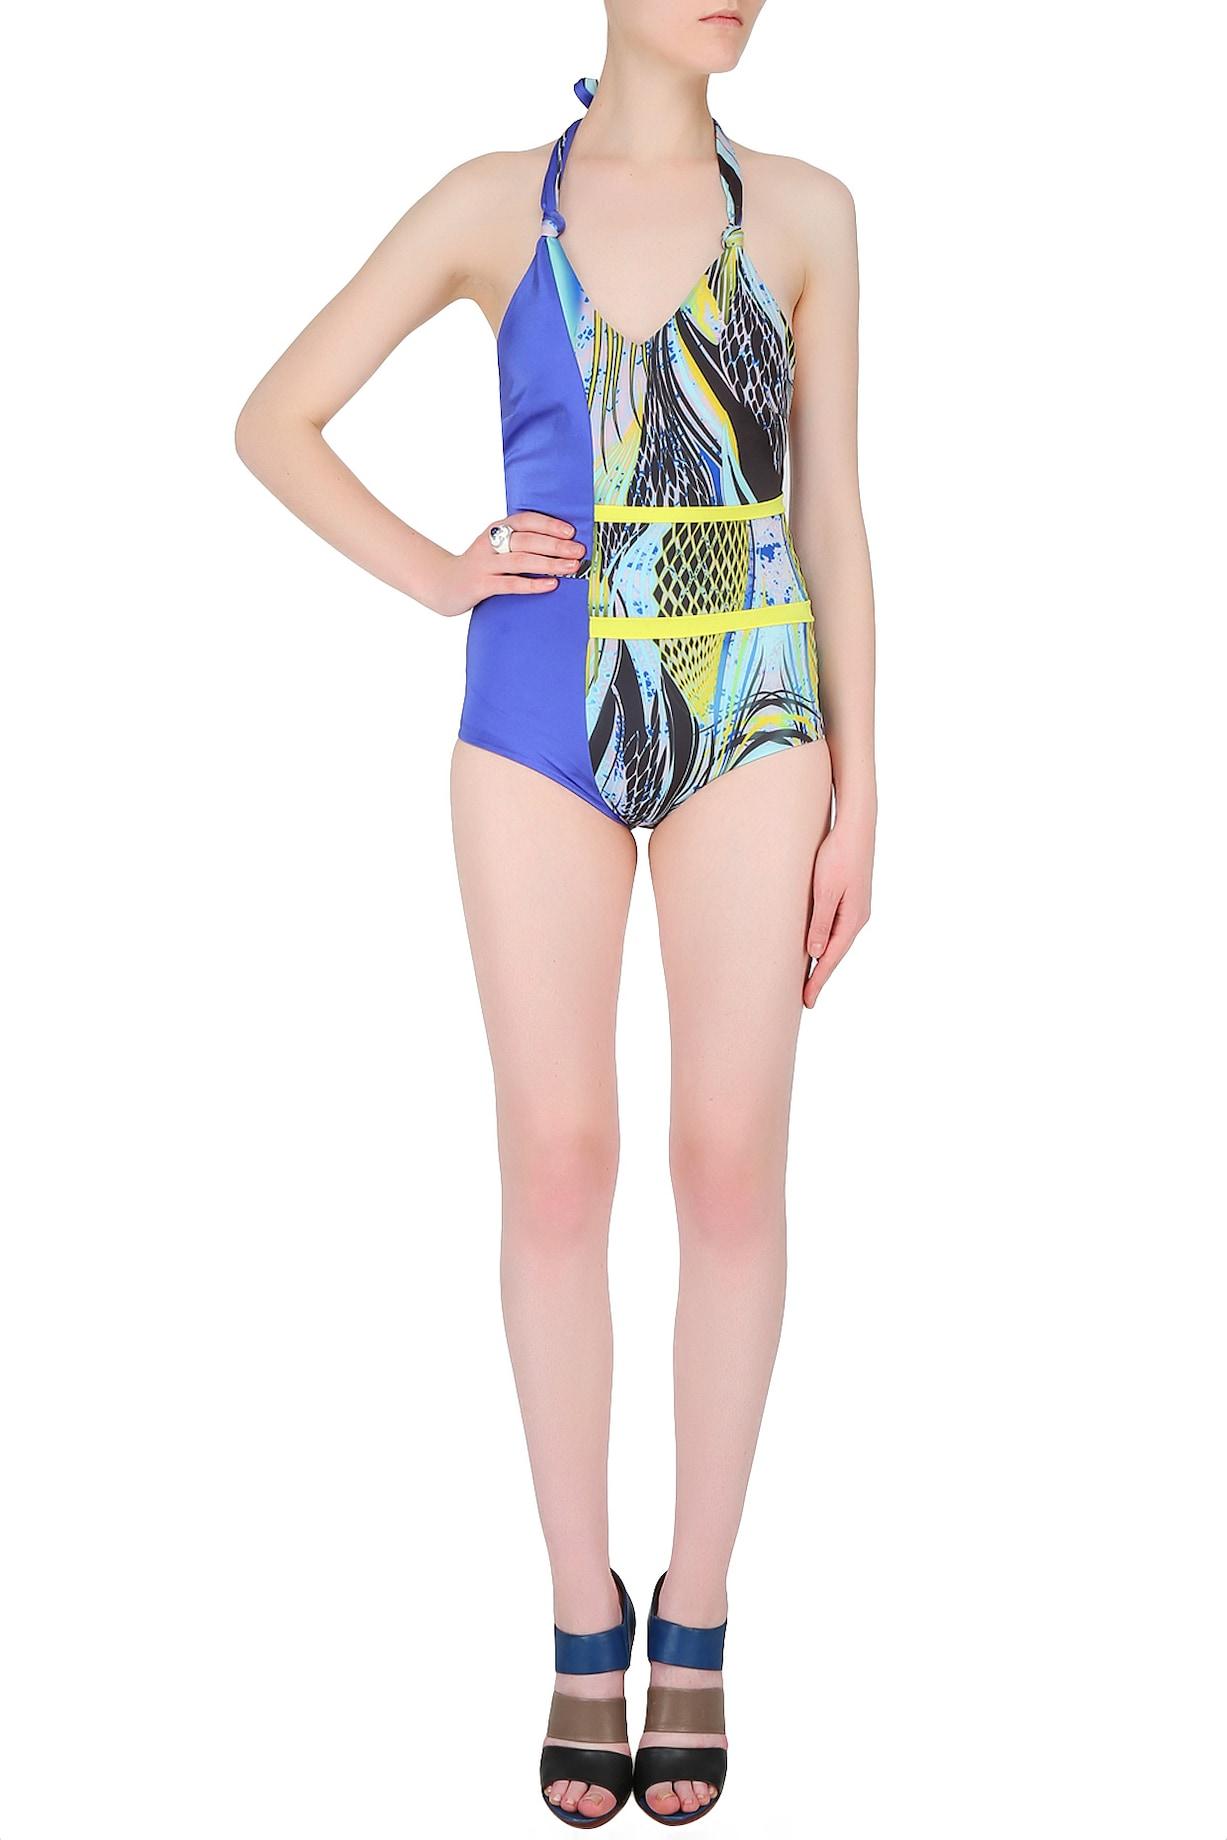 Flirtatious Swim suits